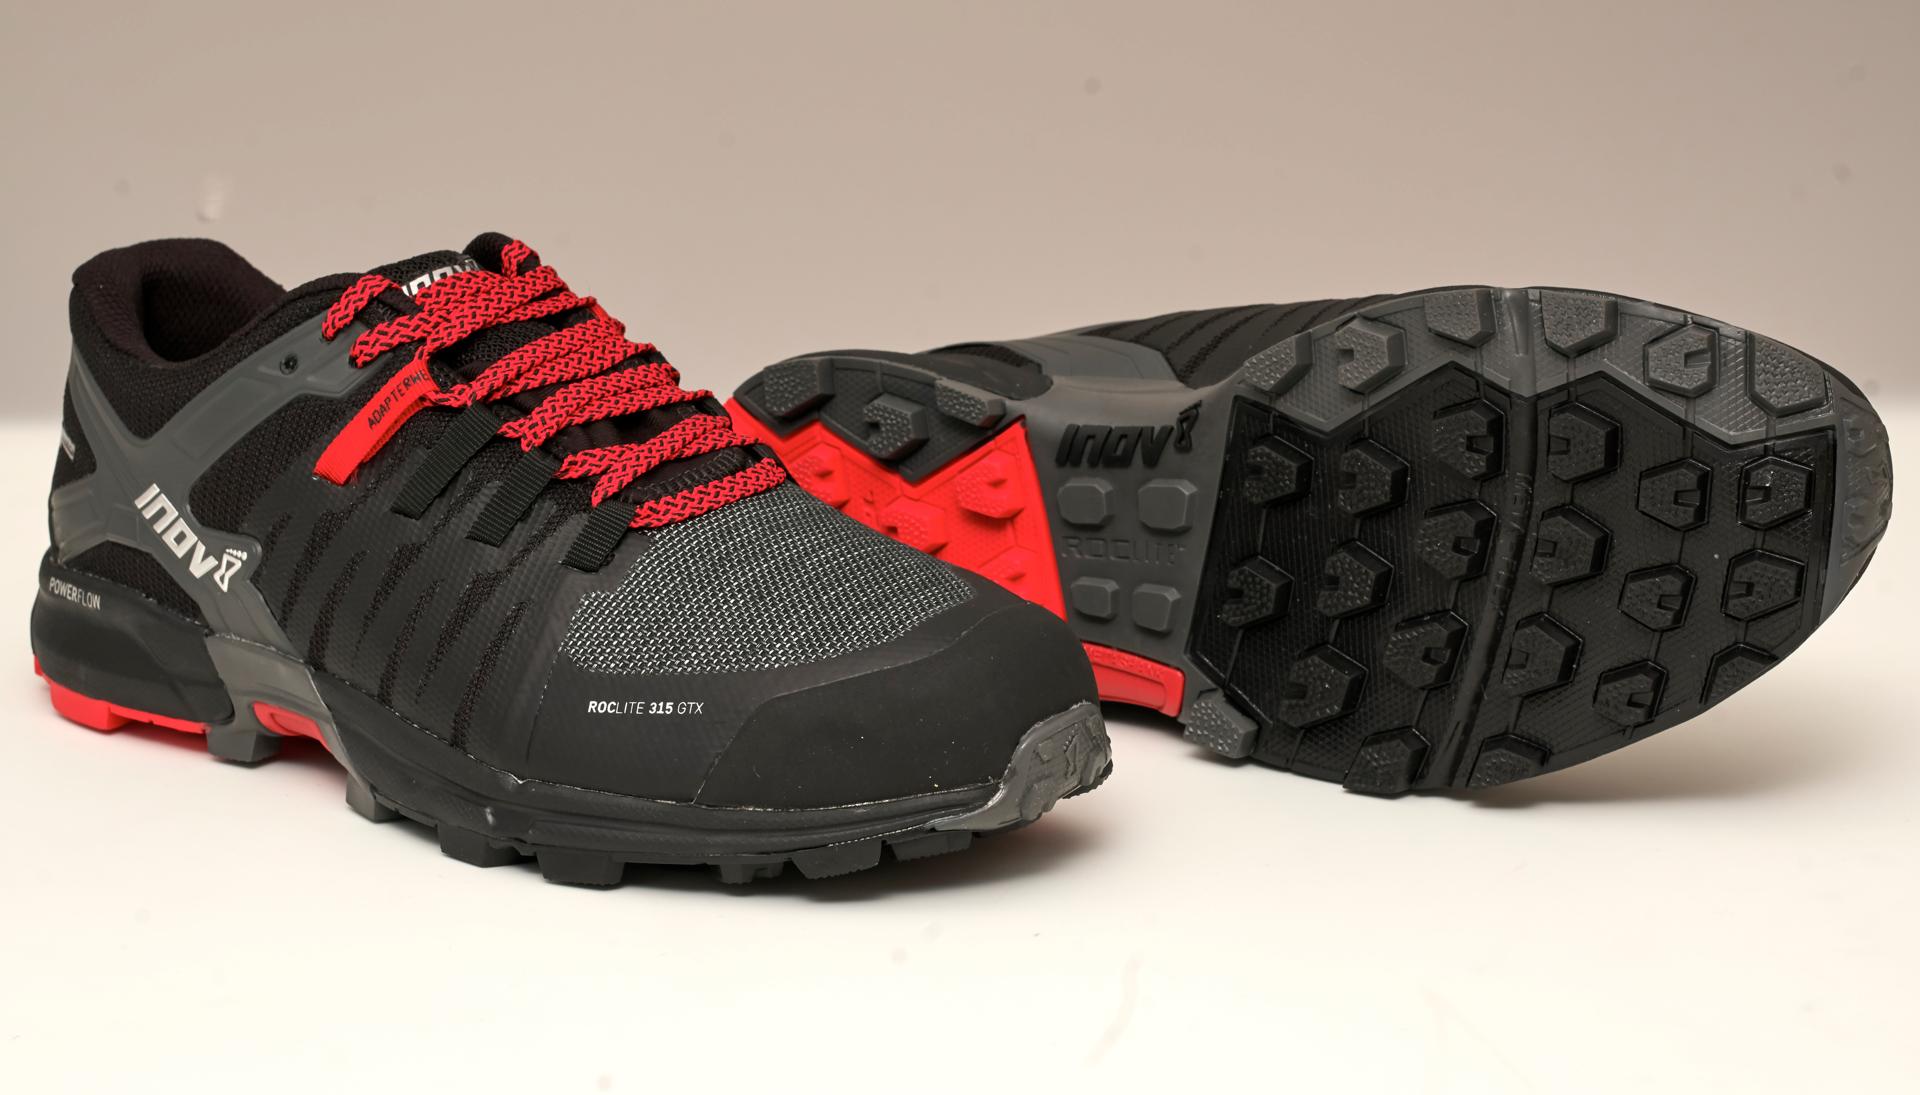 new concept bf0f3 c11a1 Inov 8 Roclite 315 GTX - xc-run.de Trailrunning